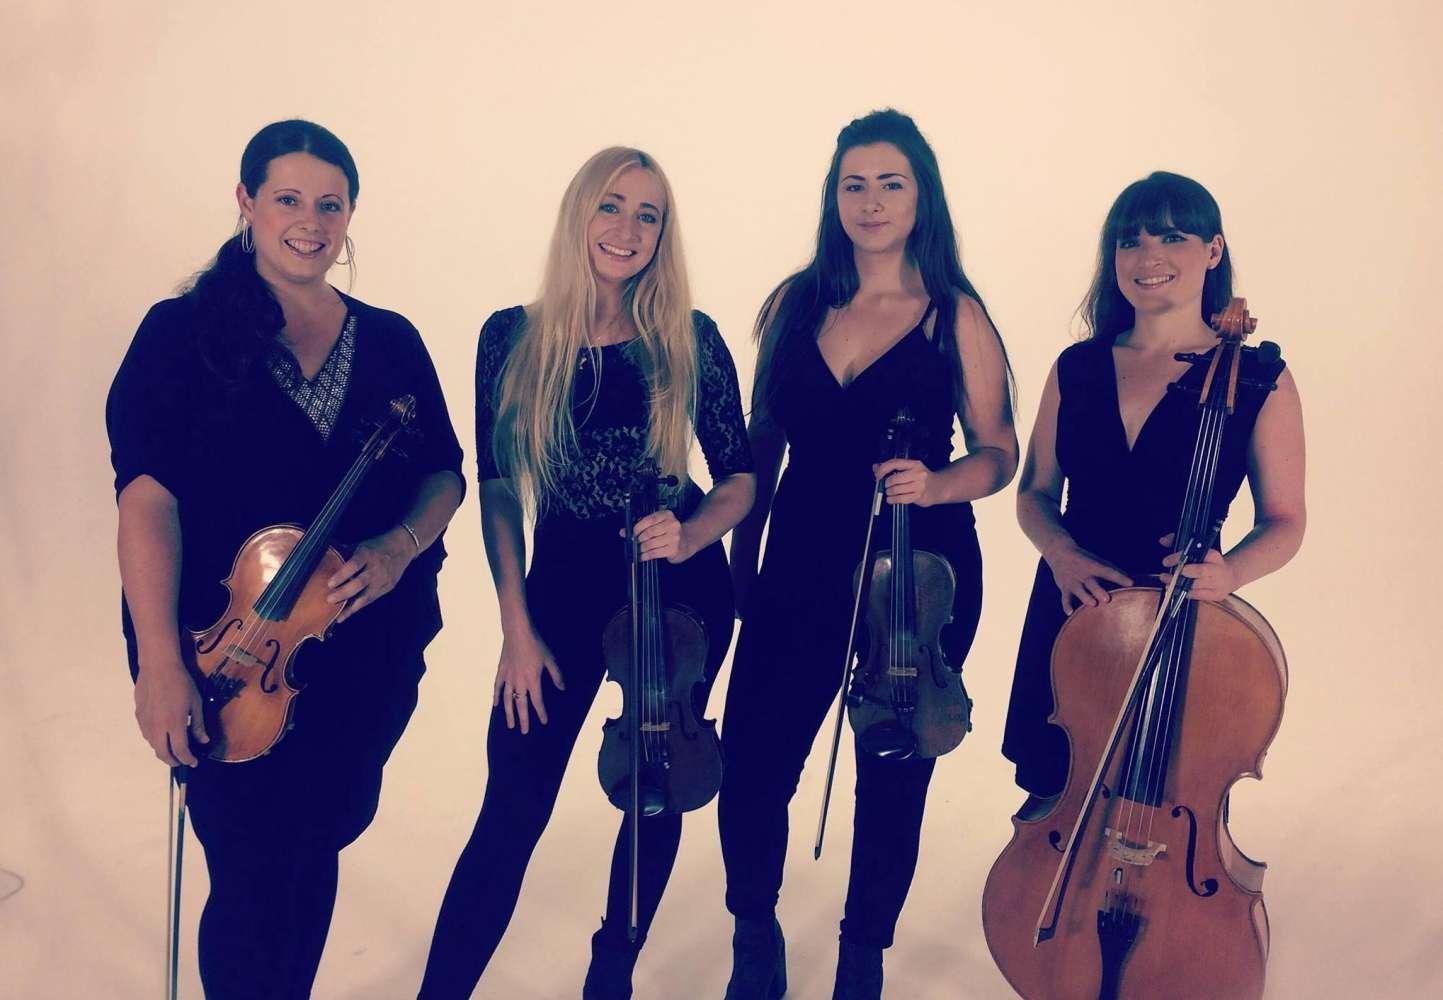 Mersey String Quartet | Liverpool String Quartet For Hire